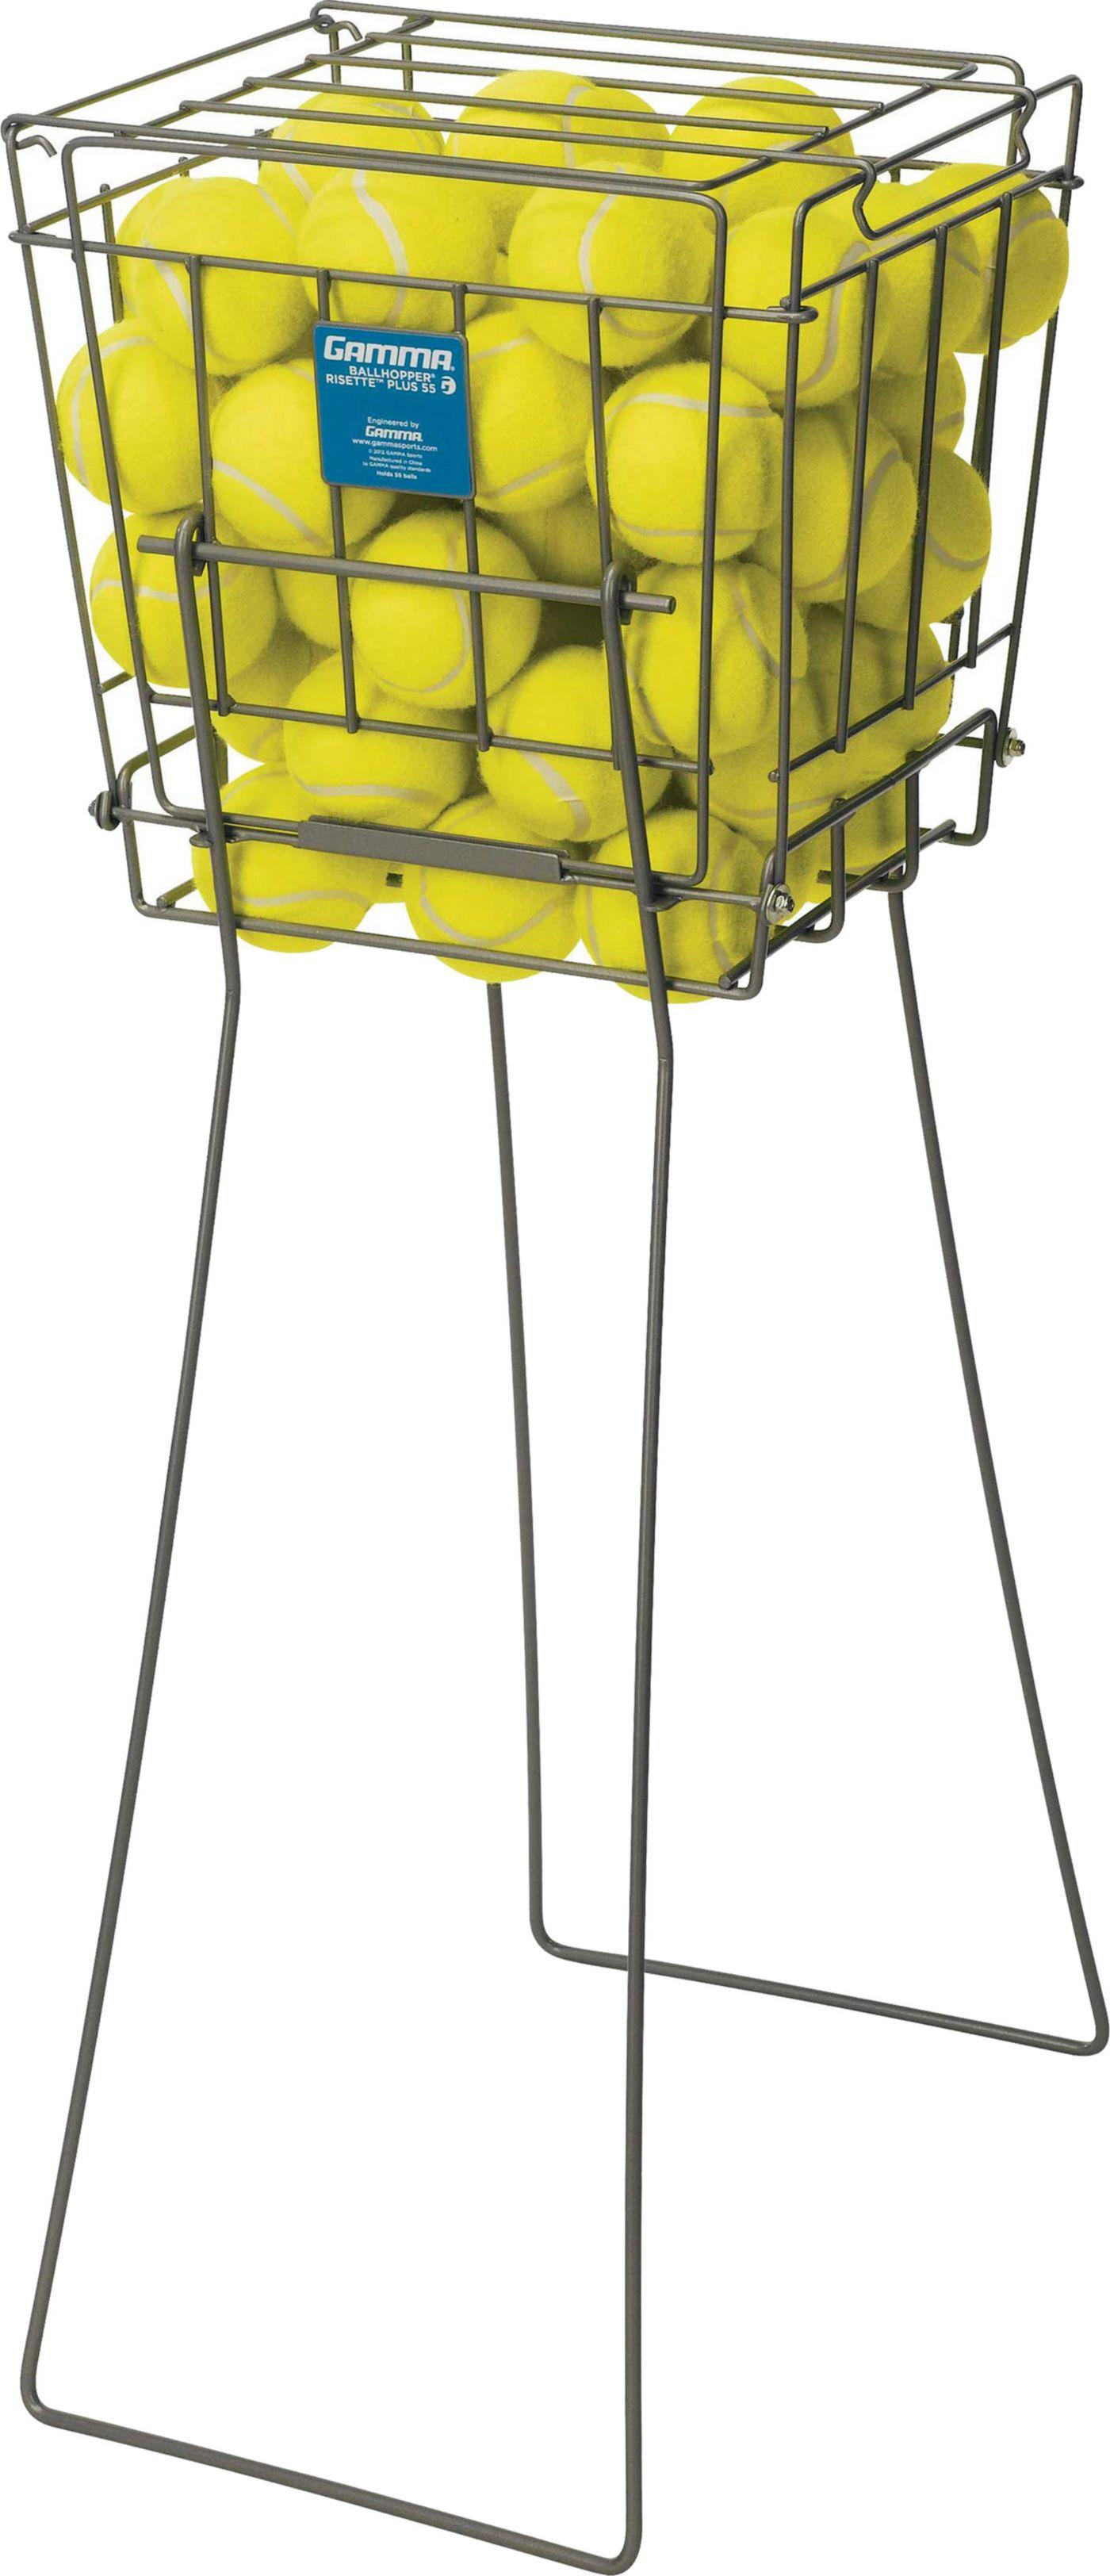 GAMMA Ballhopper Risette Plus 55